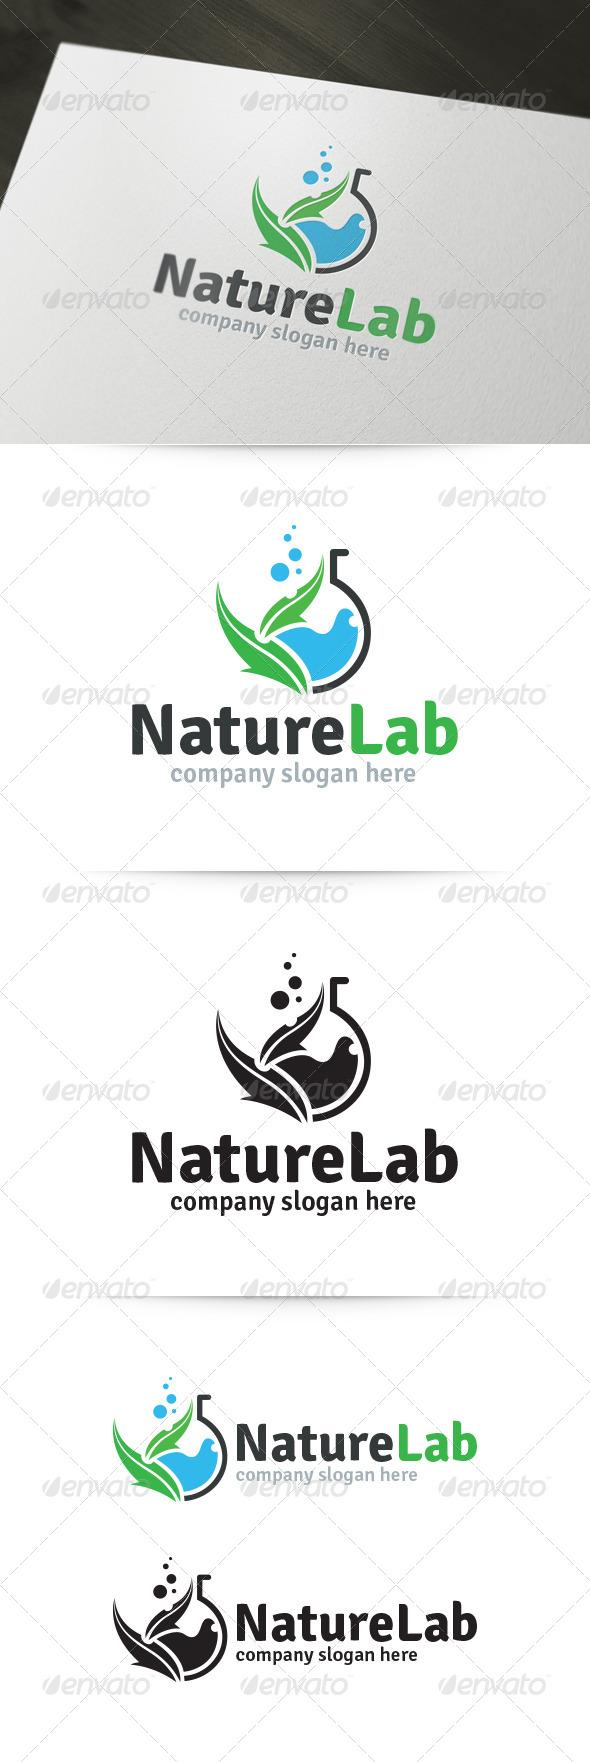 GraphicRiver Nature Lab Logo 5819097